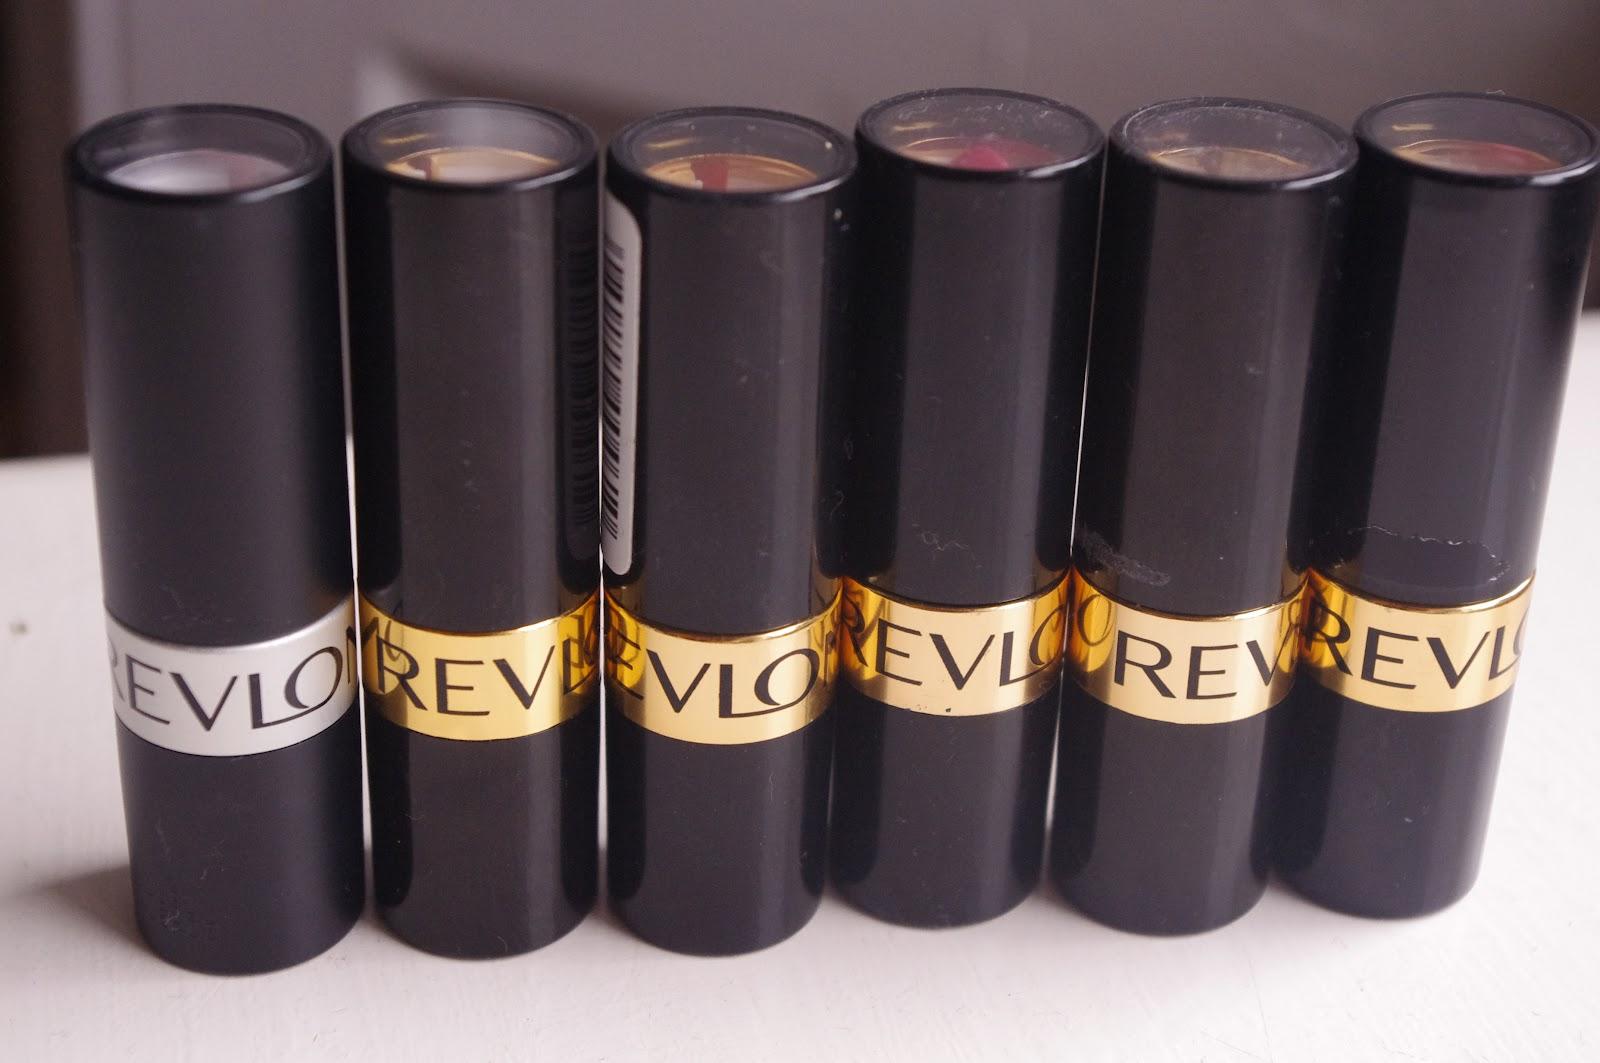 Harga Lipstik Revlon Terbaru Agustus 2018, Cek